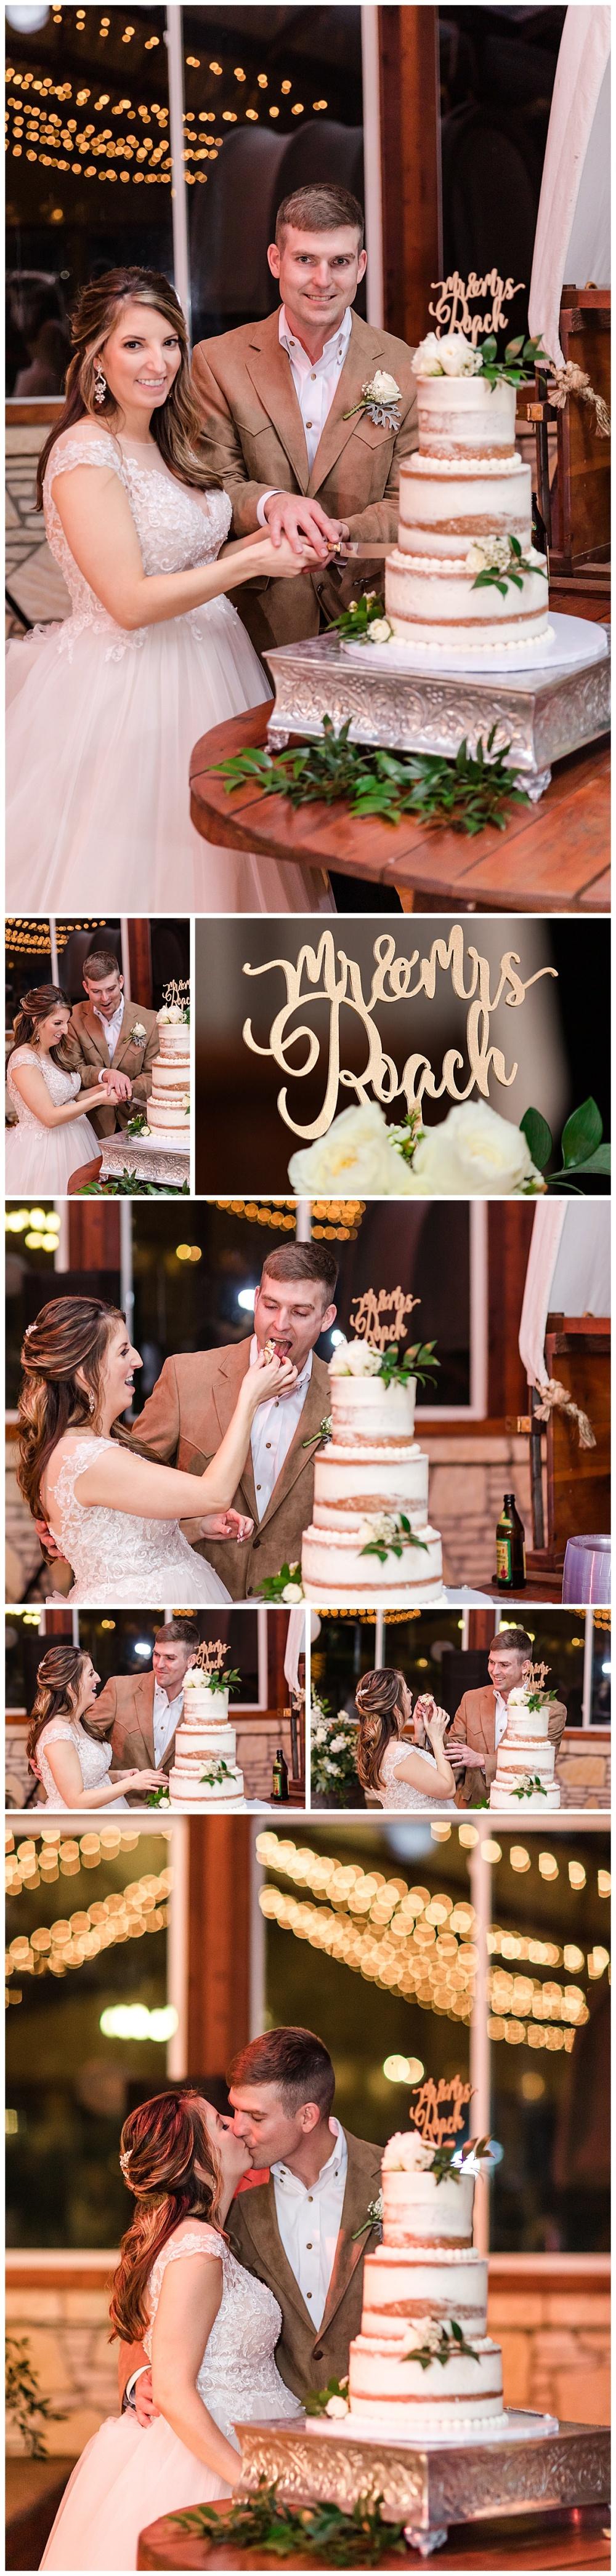 Wedding-Photographer-Texas-Hill-Country-Happy-H-Ranch-Comfor-Texas-Carly-Barton-Photography_0079.jpg